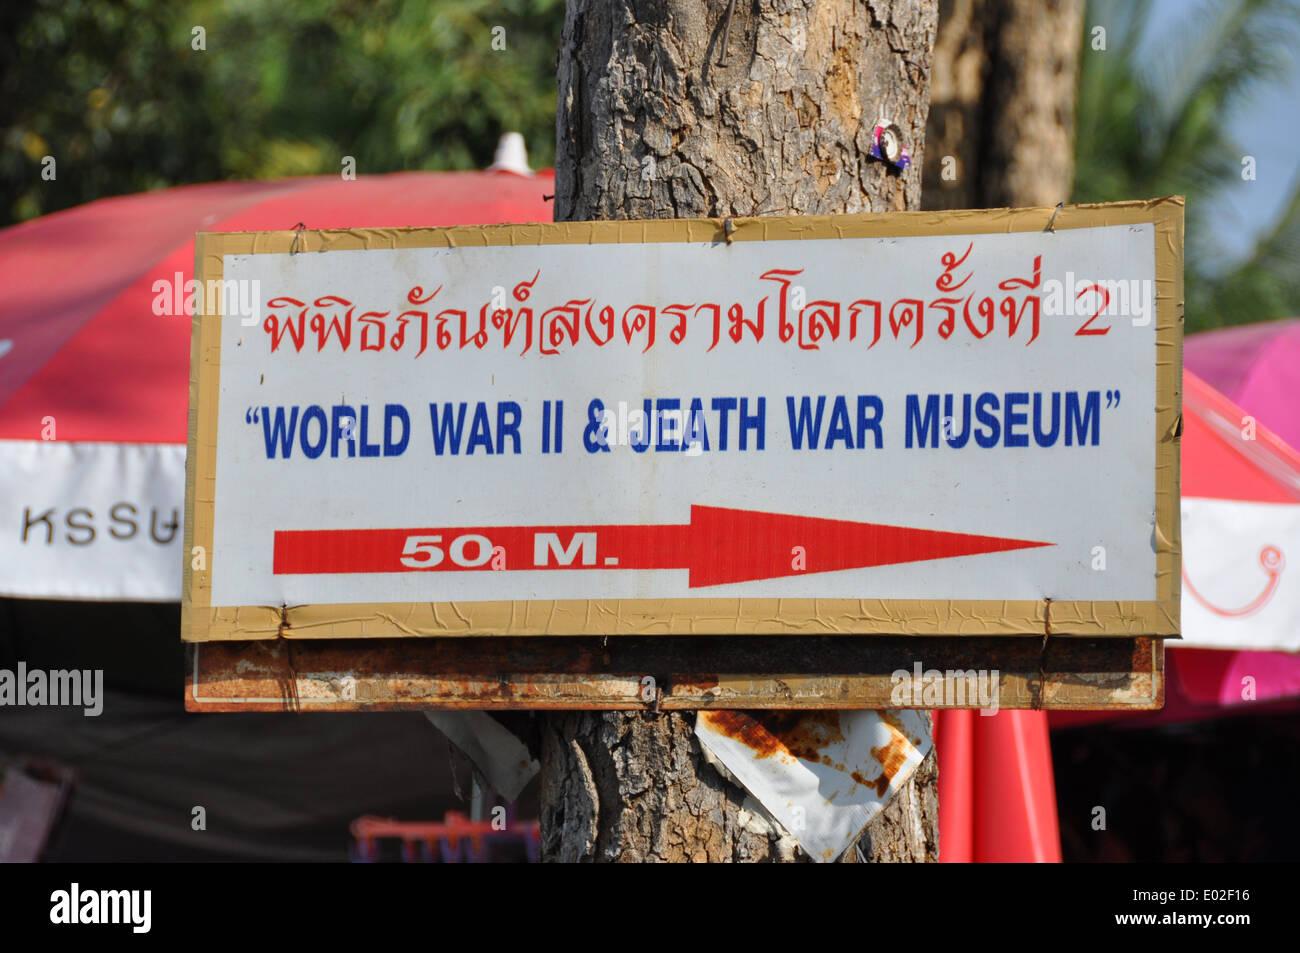 Sign for the Thailand–Burma Railway Museum in Kanchanaburi, Thailand. - Stock Image